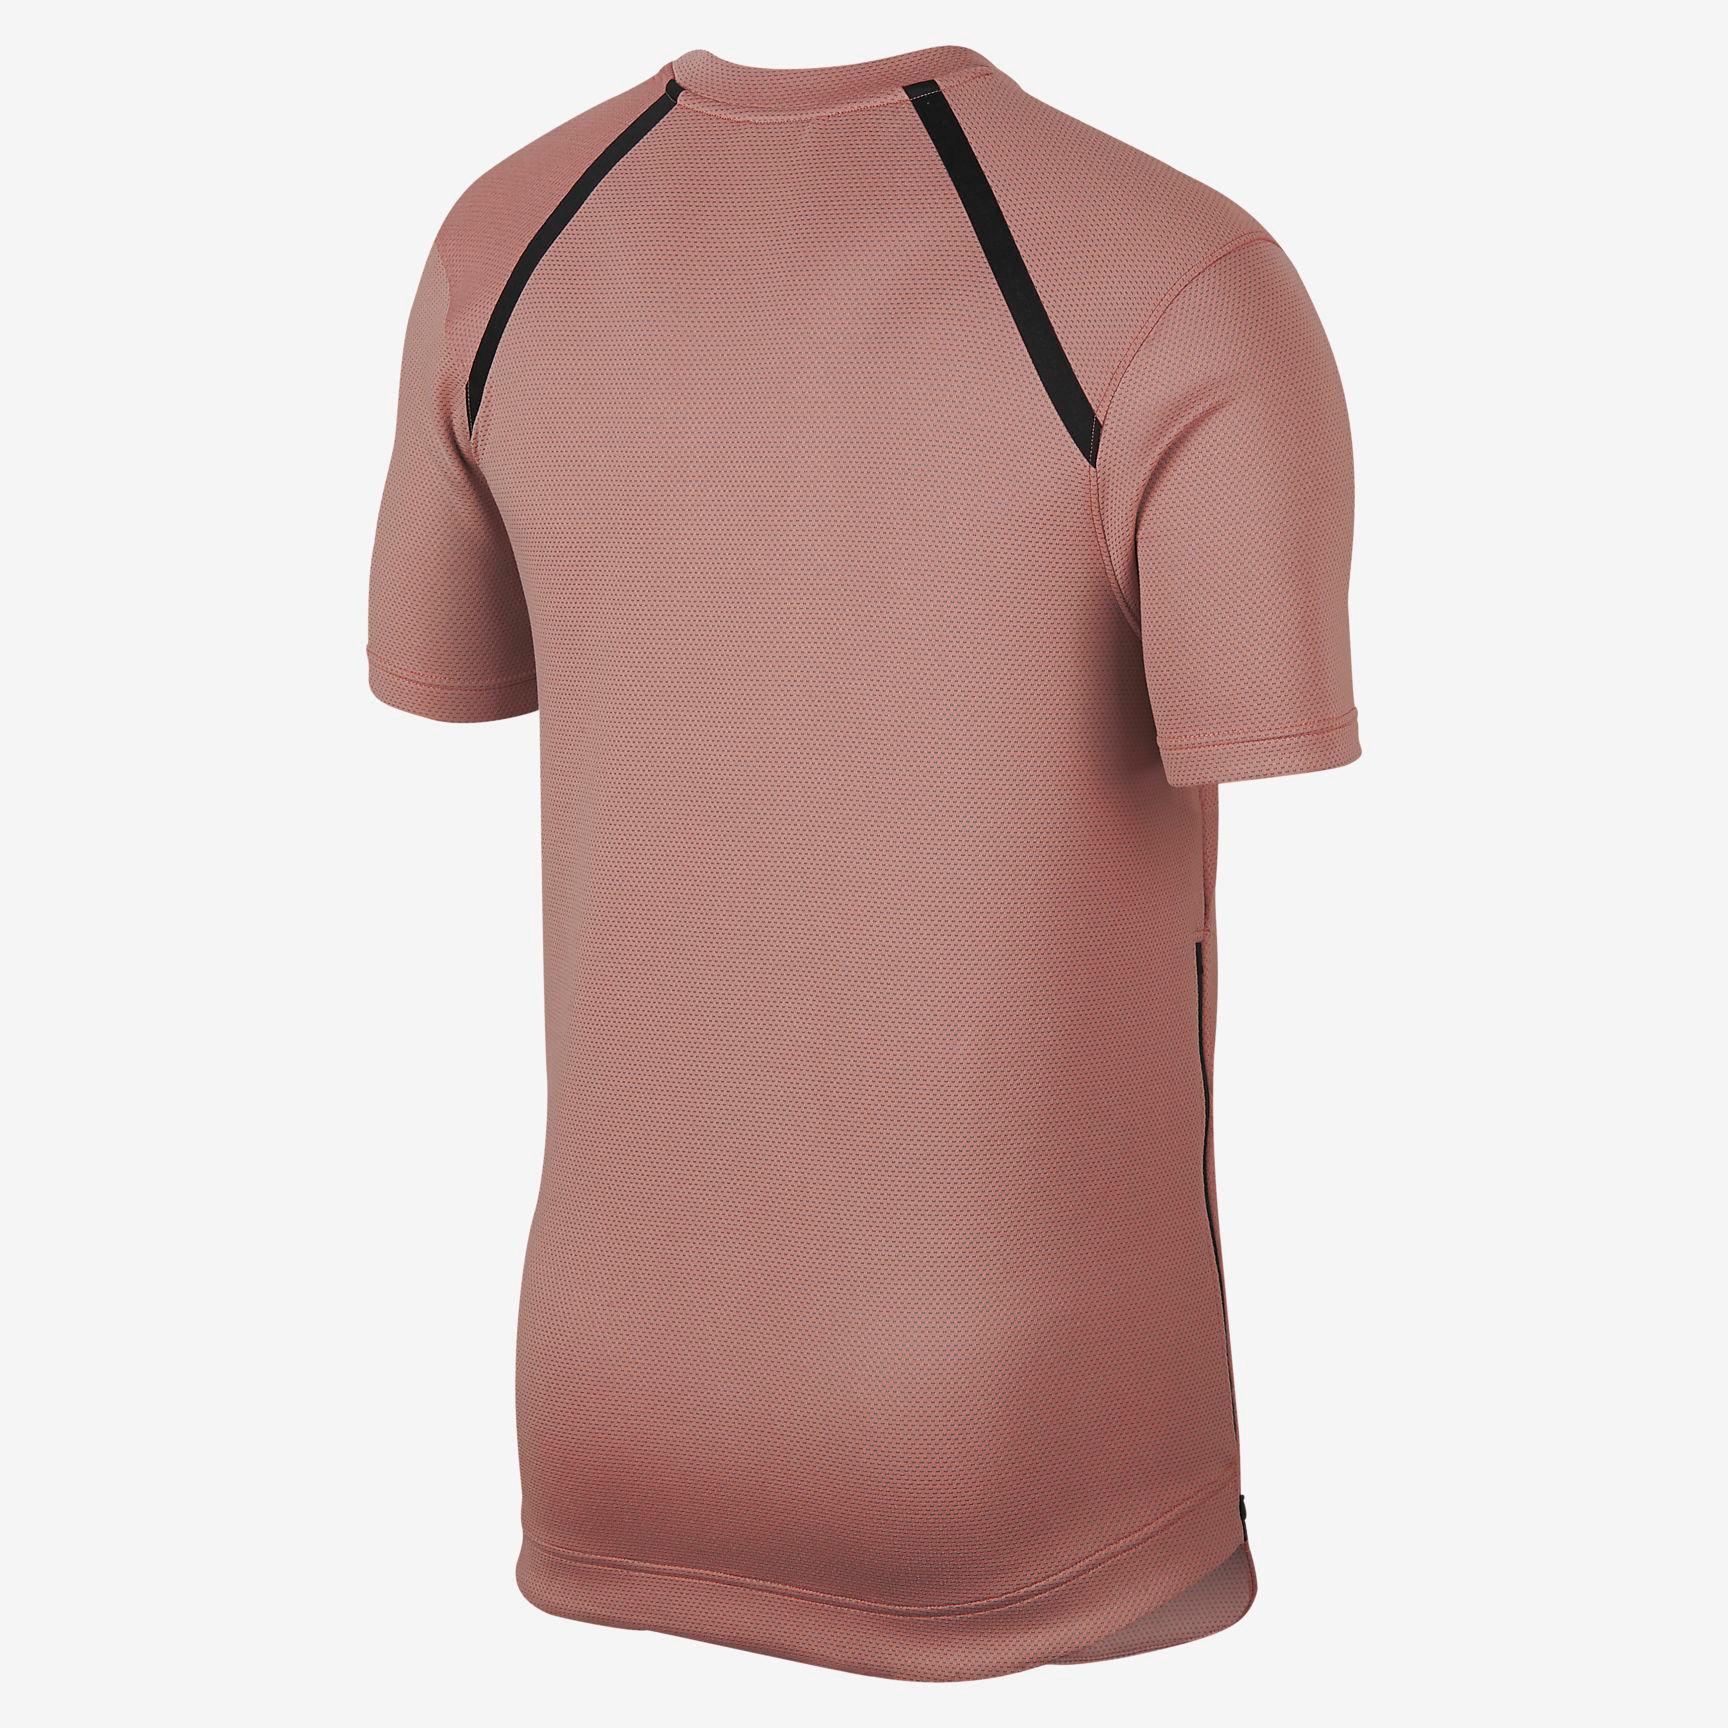 nike-air-foamposite-one-foamposite-rust-pink-shirt-match-2